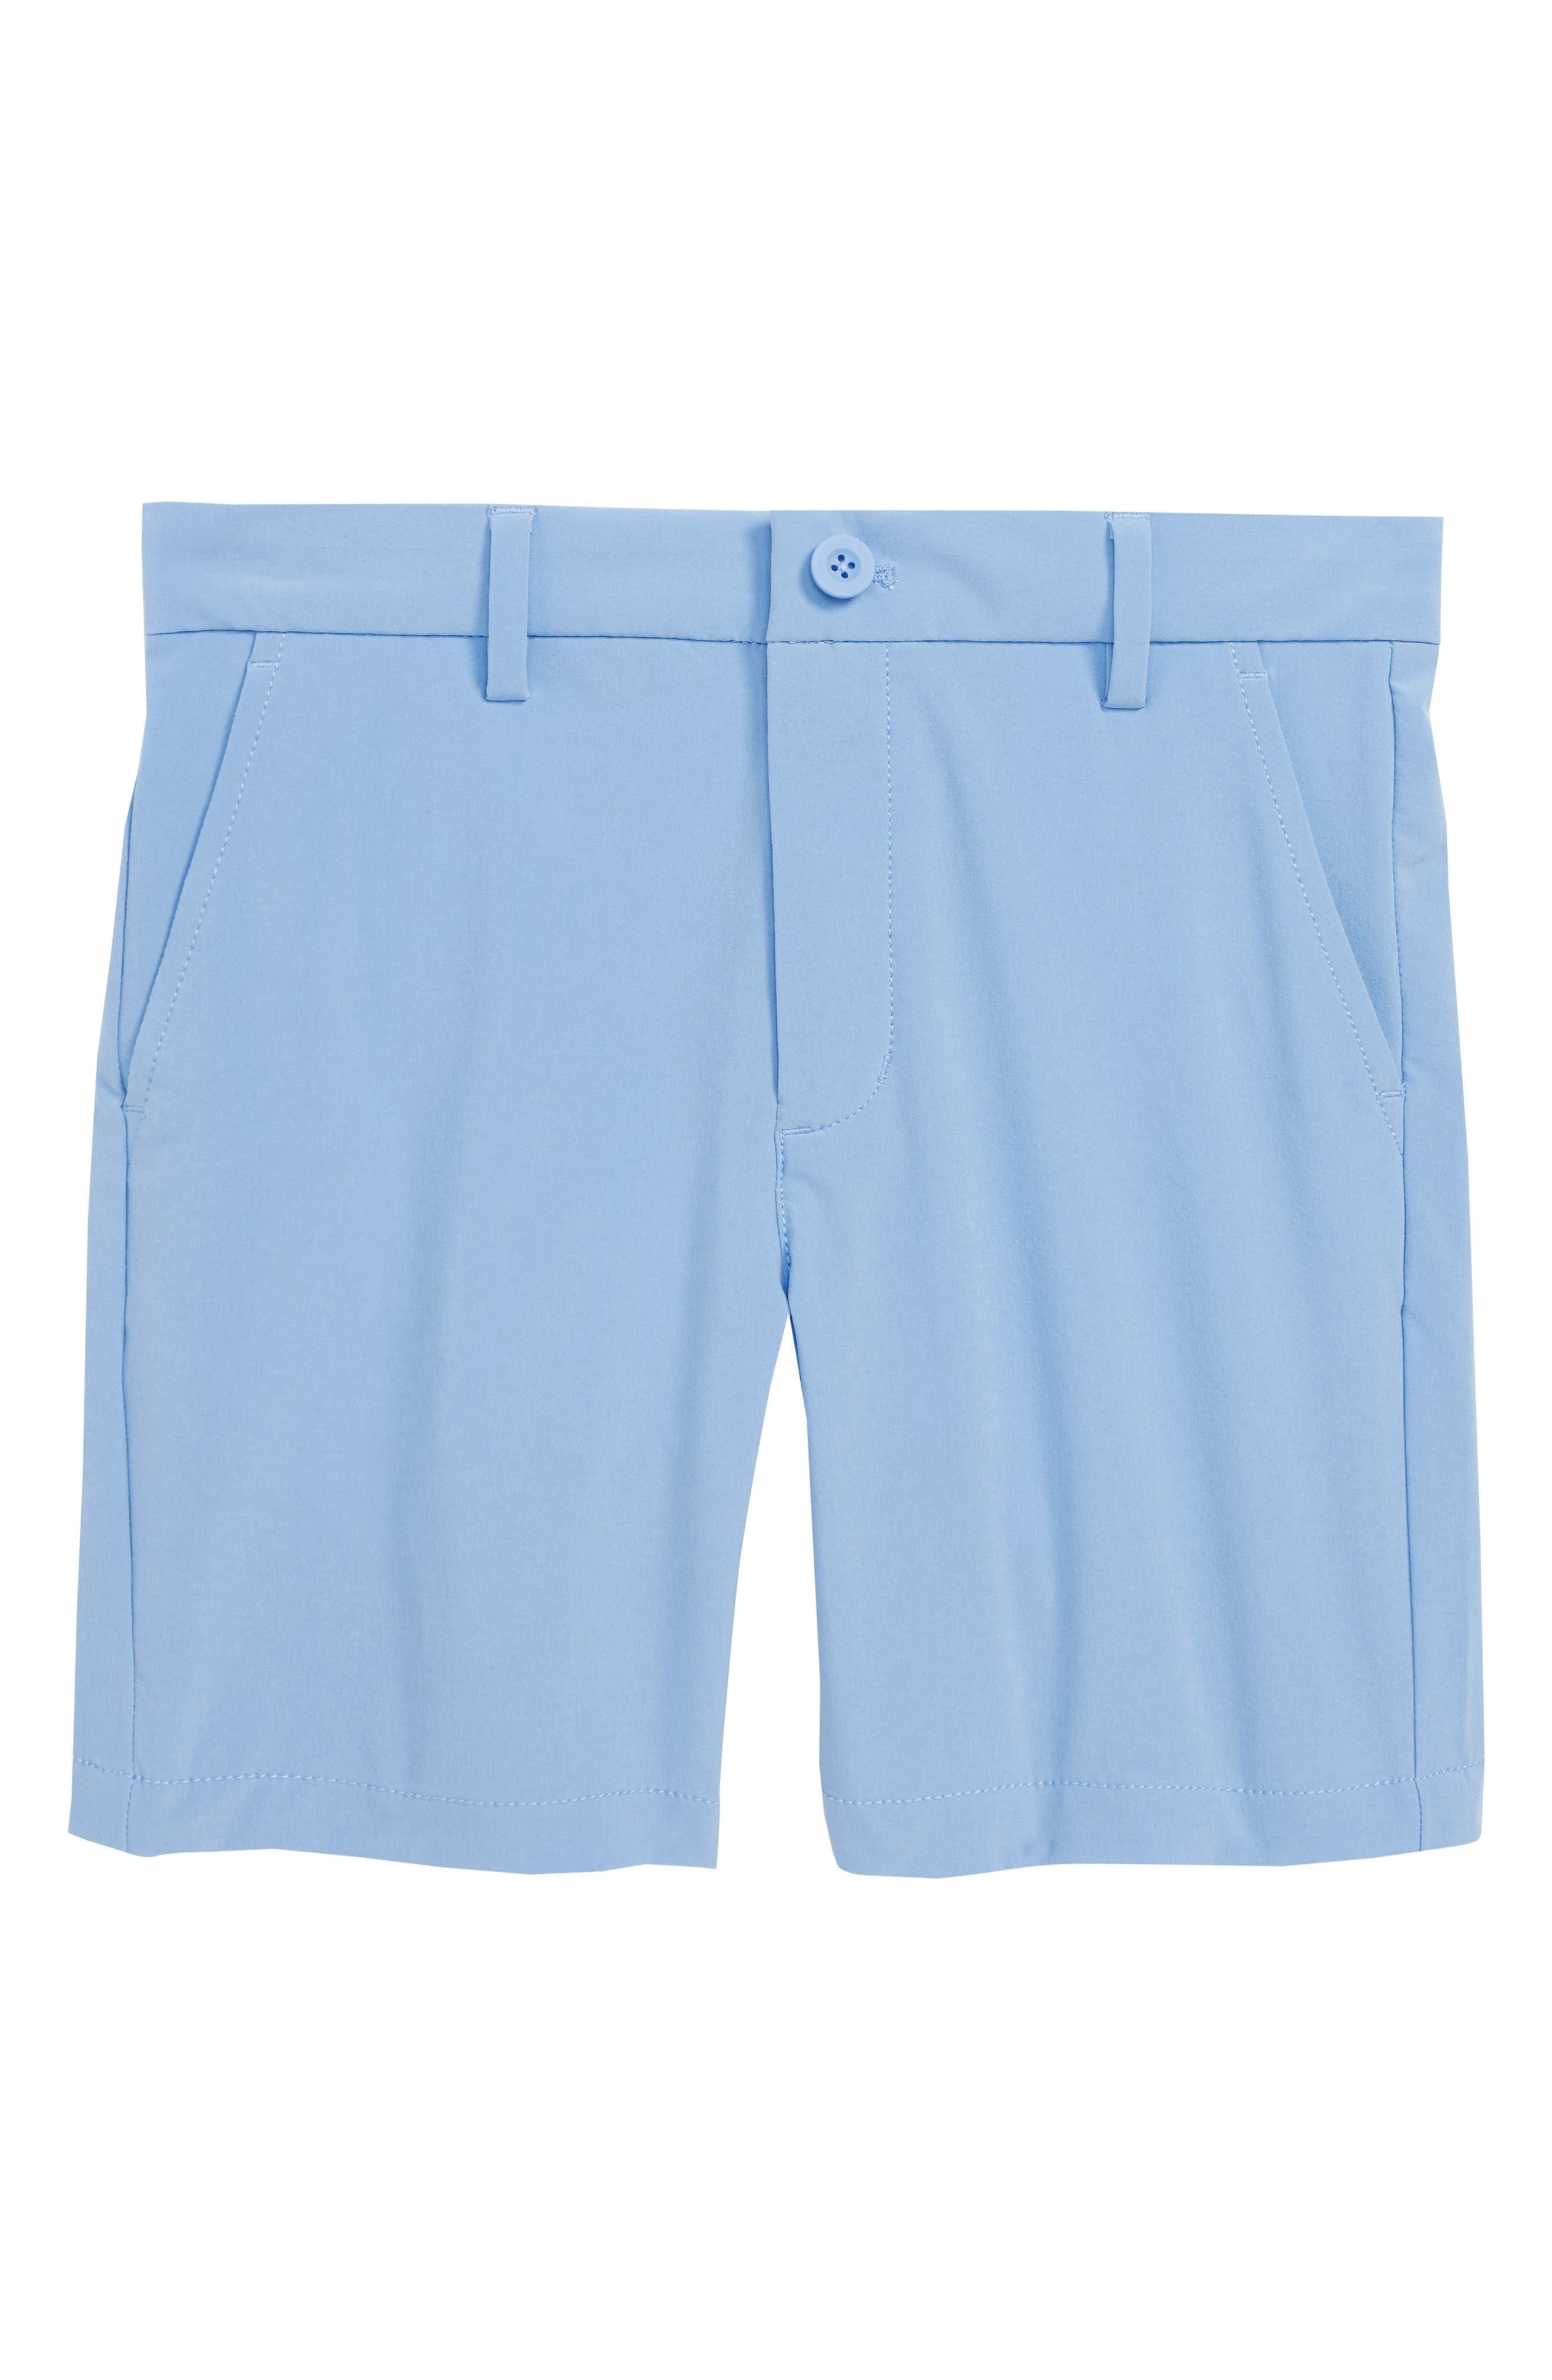 Performance Breaker Shorts,                             Main thumbnail 1, color,                             OCEAN BREEZE